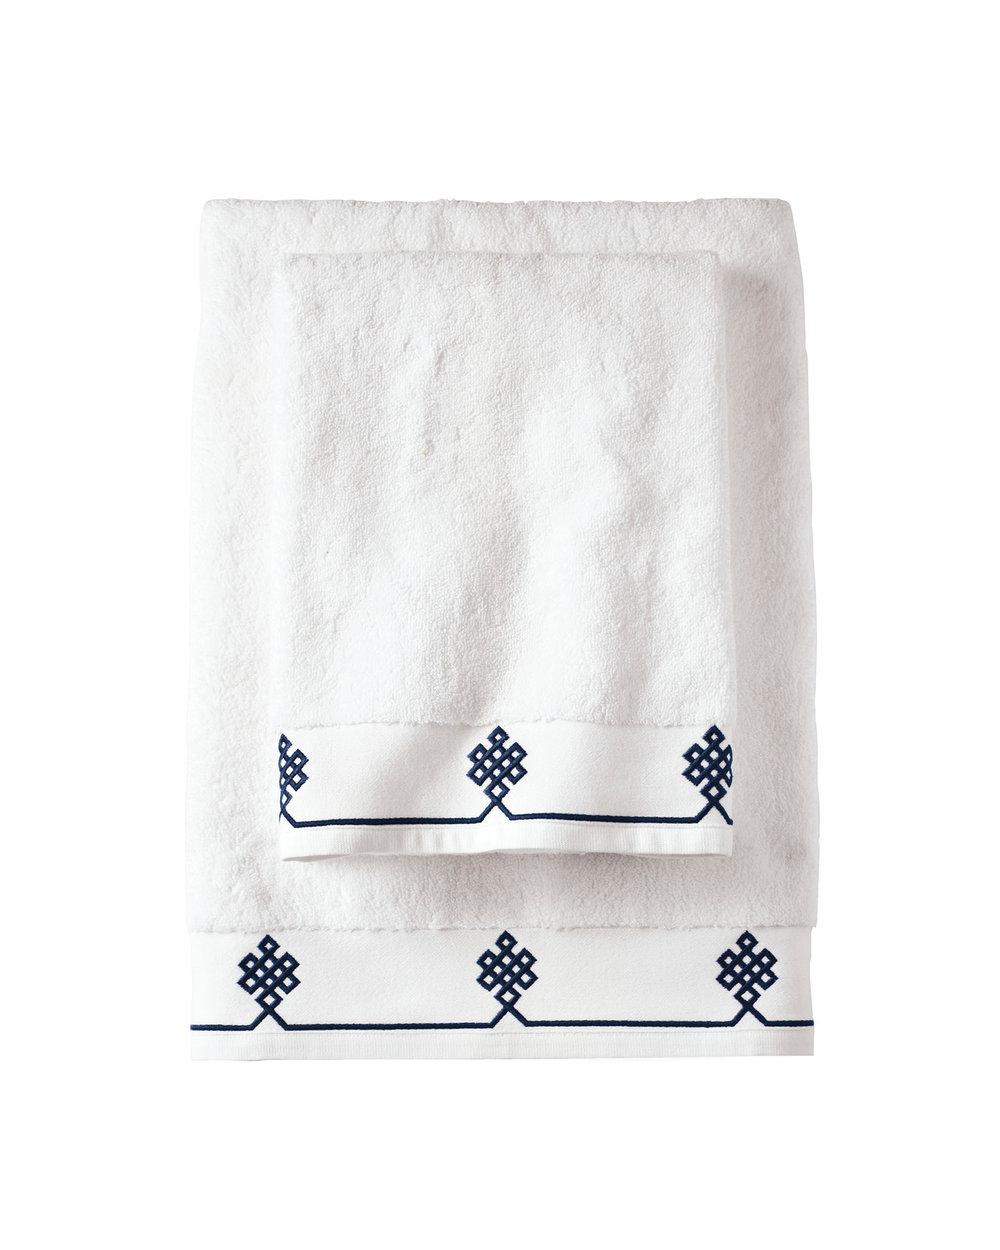 Gobi_Bath_Towels_Navy_1.jpg